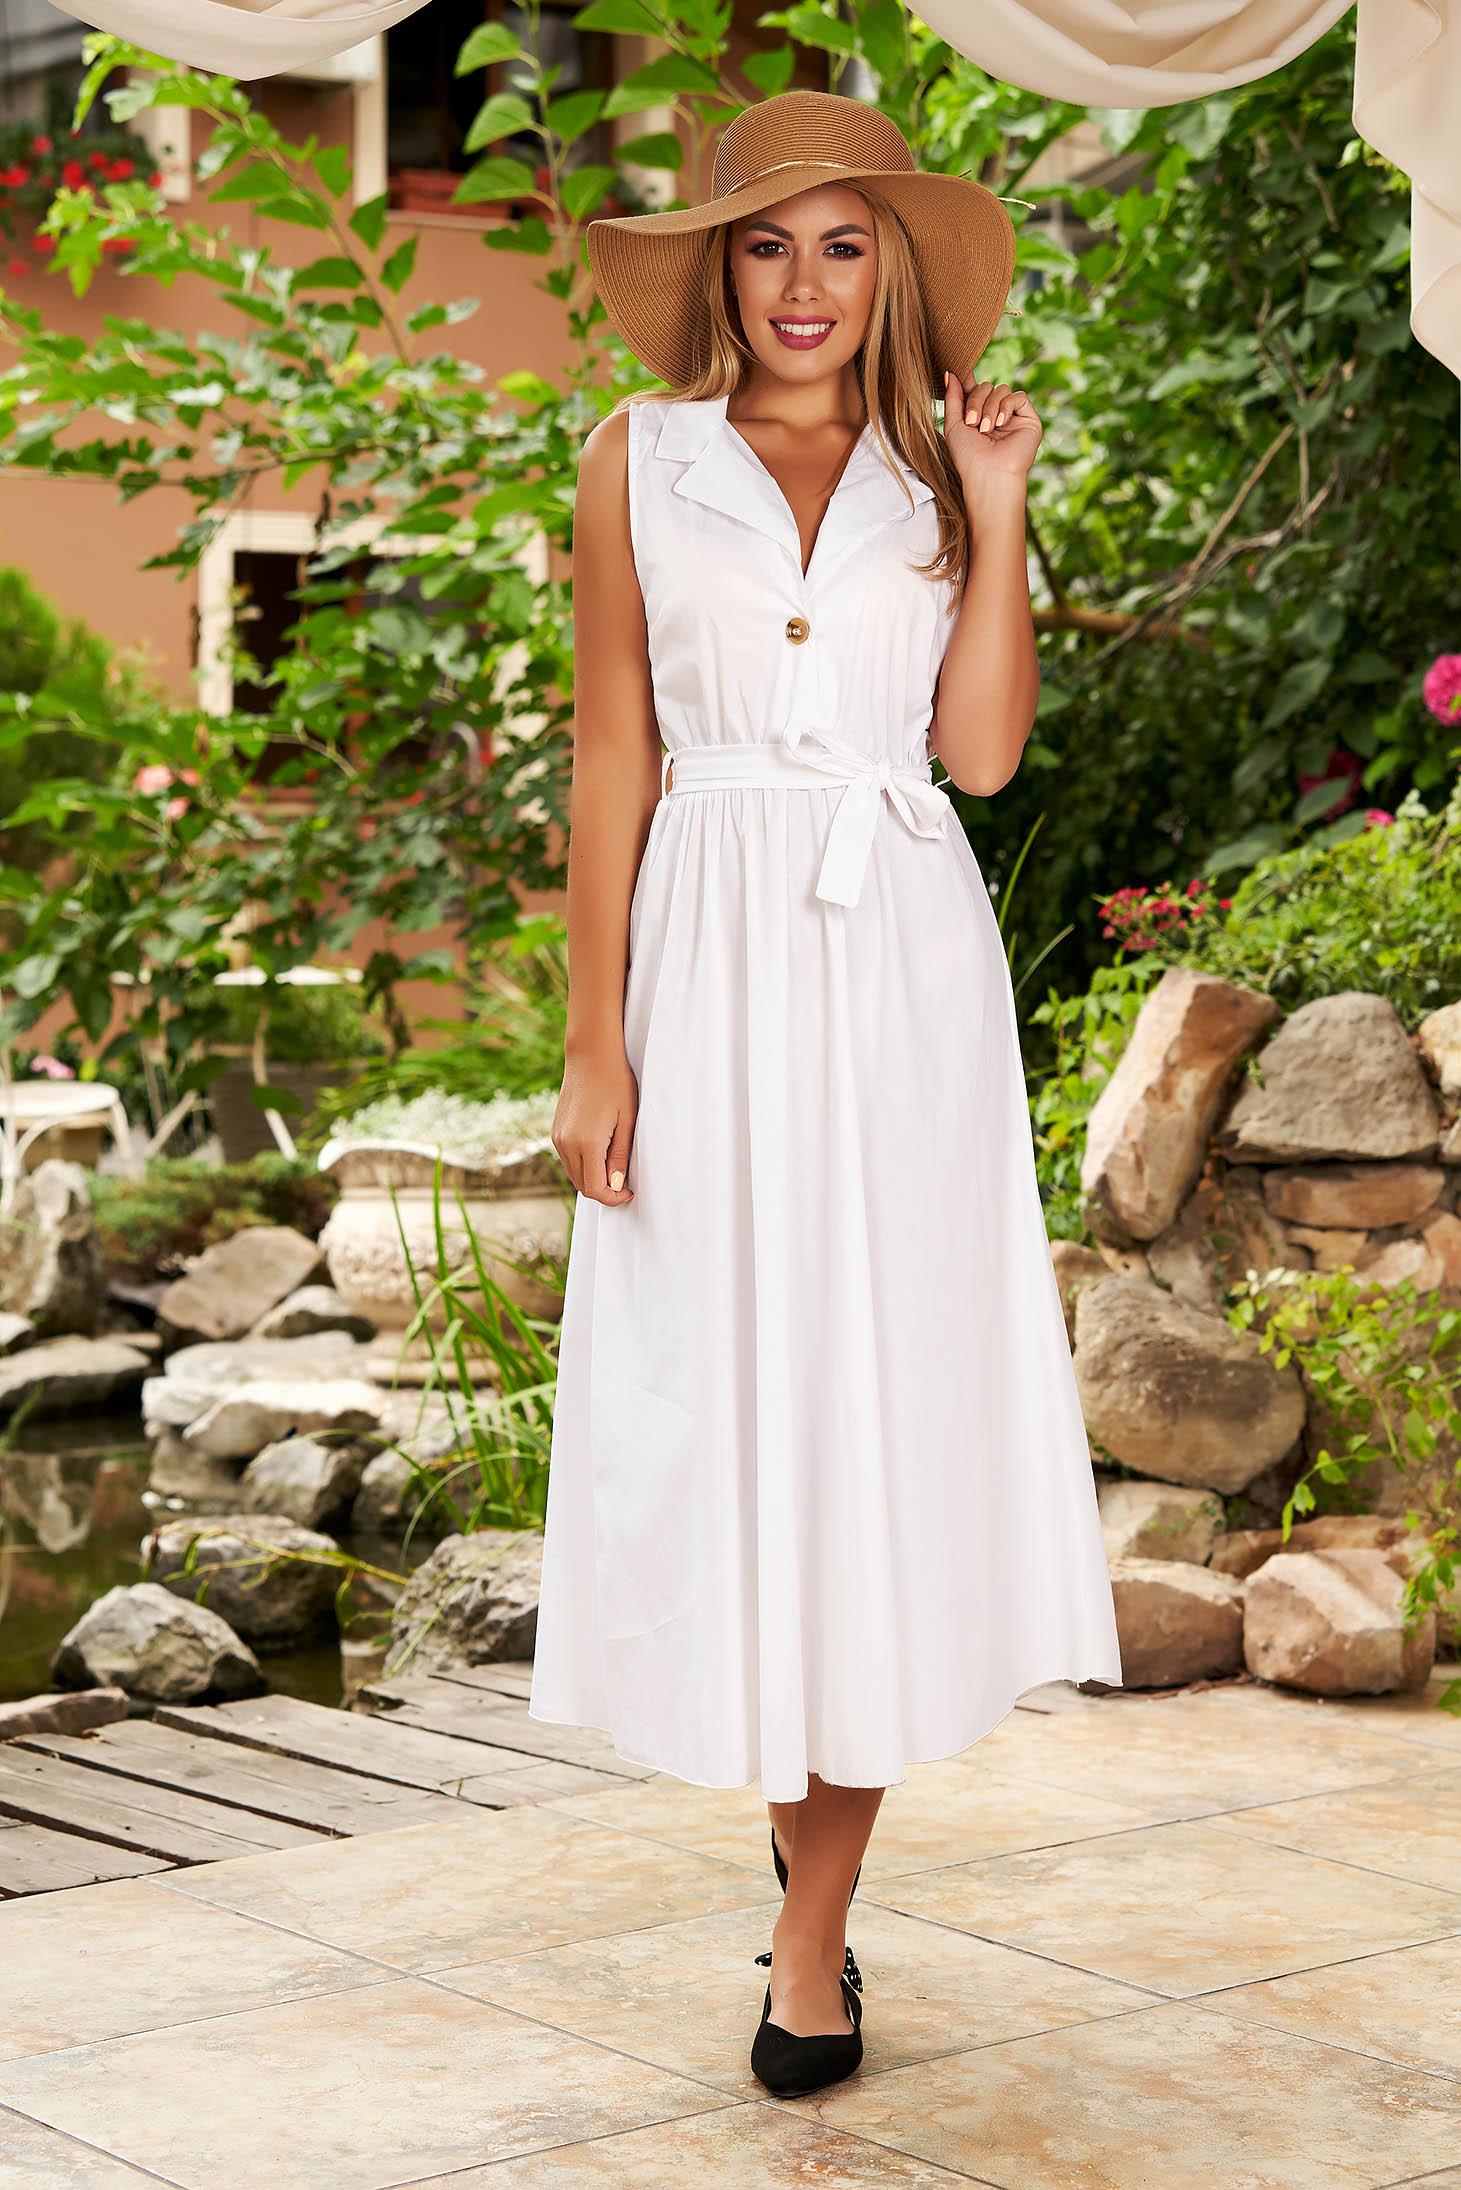 Daily midi cloche white cotton dress with elastic waist detachable cord